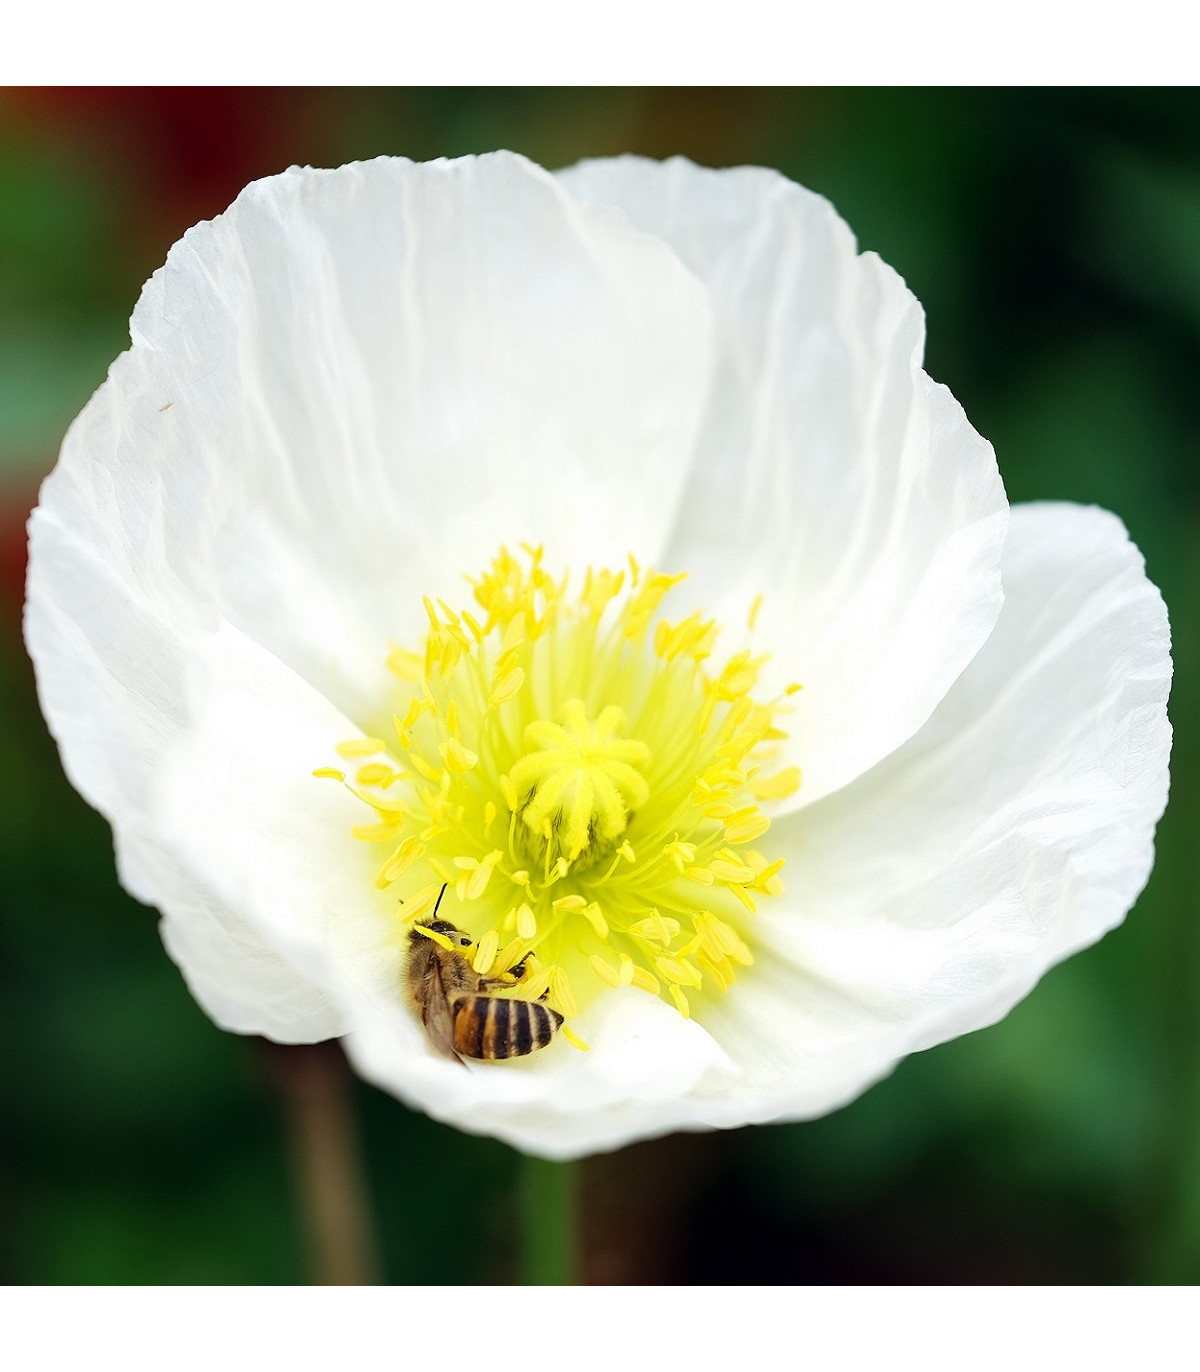 Mák Bridal Silk - Papaver rhoeas - semena máku - 150 ks